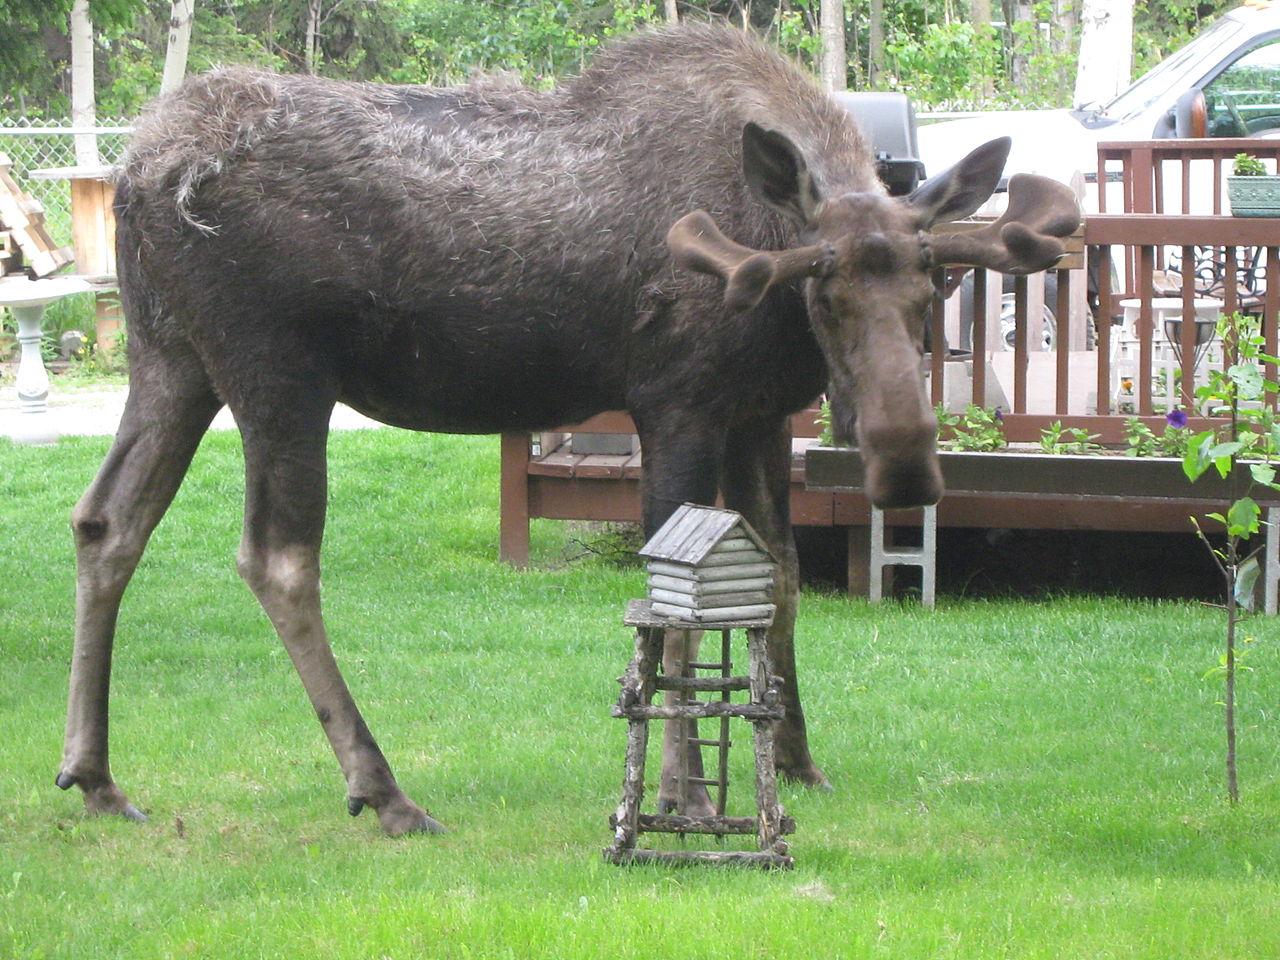 filebull moose growing new antlers and shedding furjpg